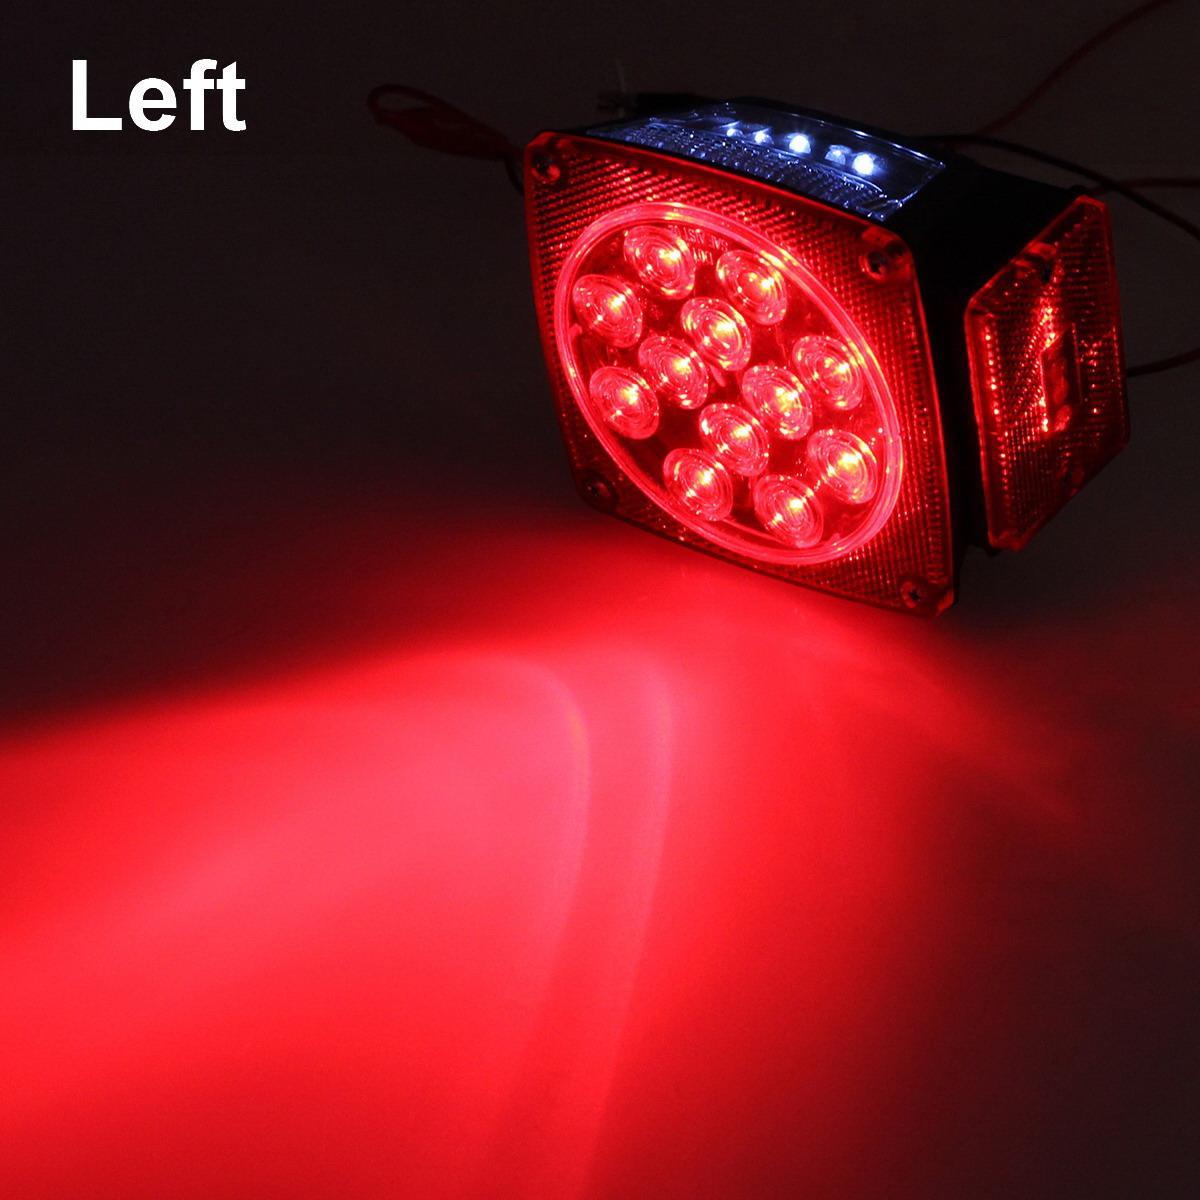 Led Trailer Boat Light Kit Stop Turn Tail Side Marker